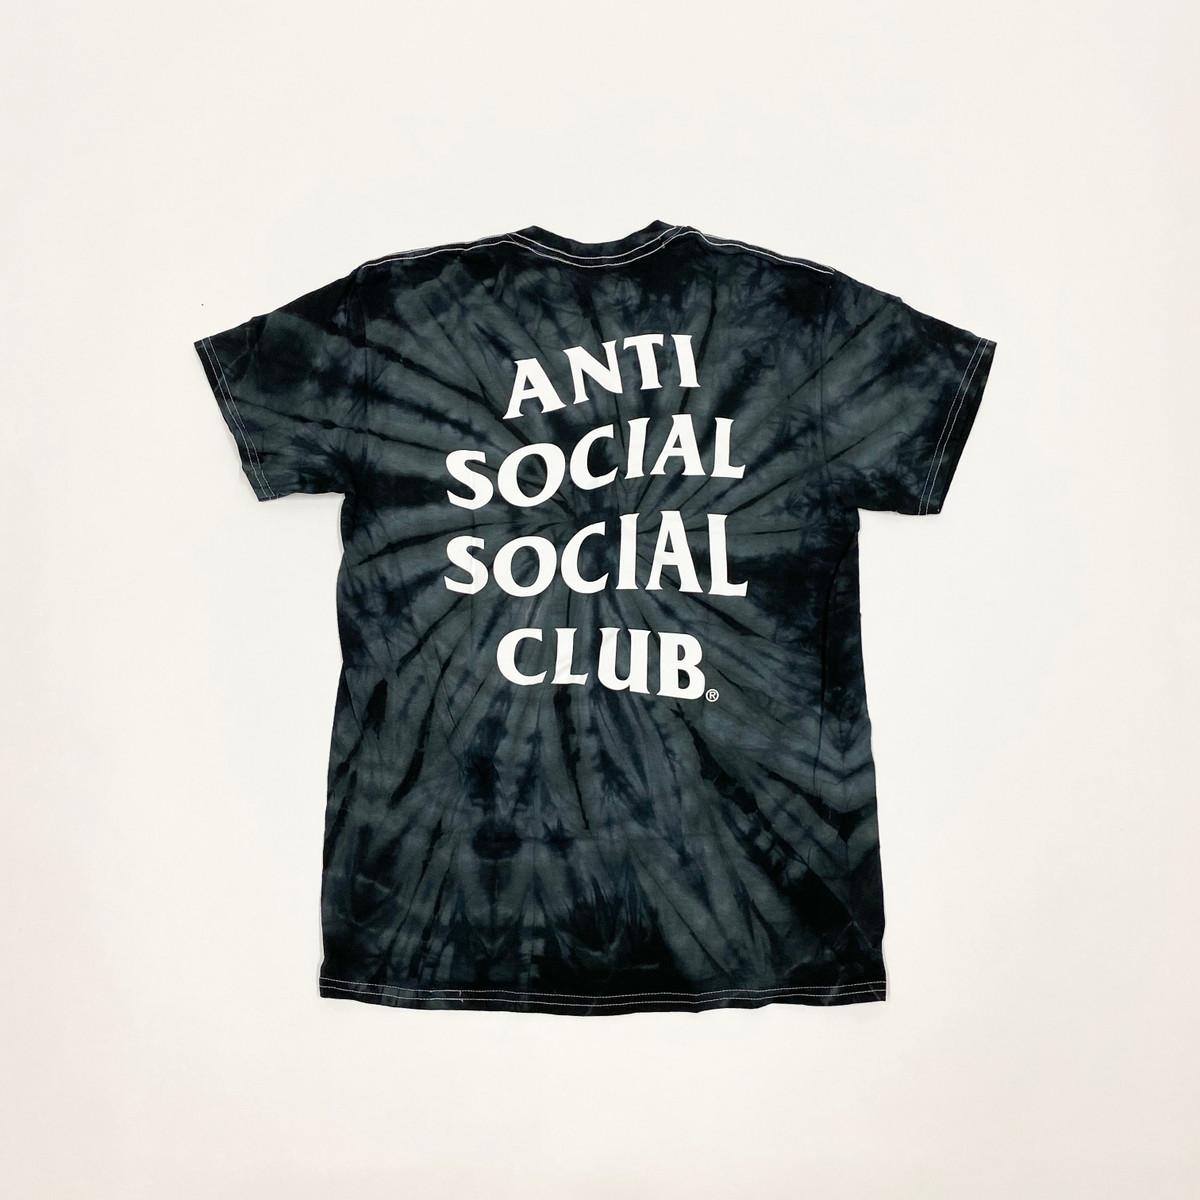 Anti Social Social Club Laguna TieDye Tee Black